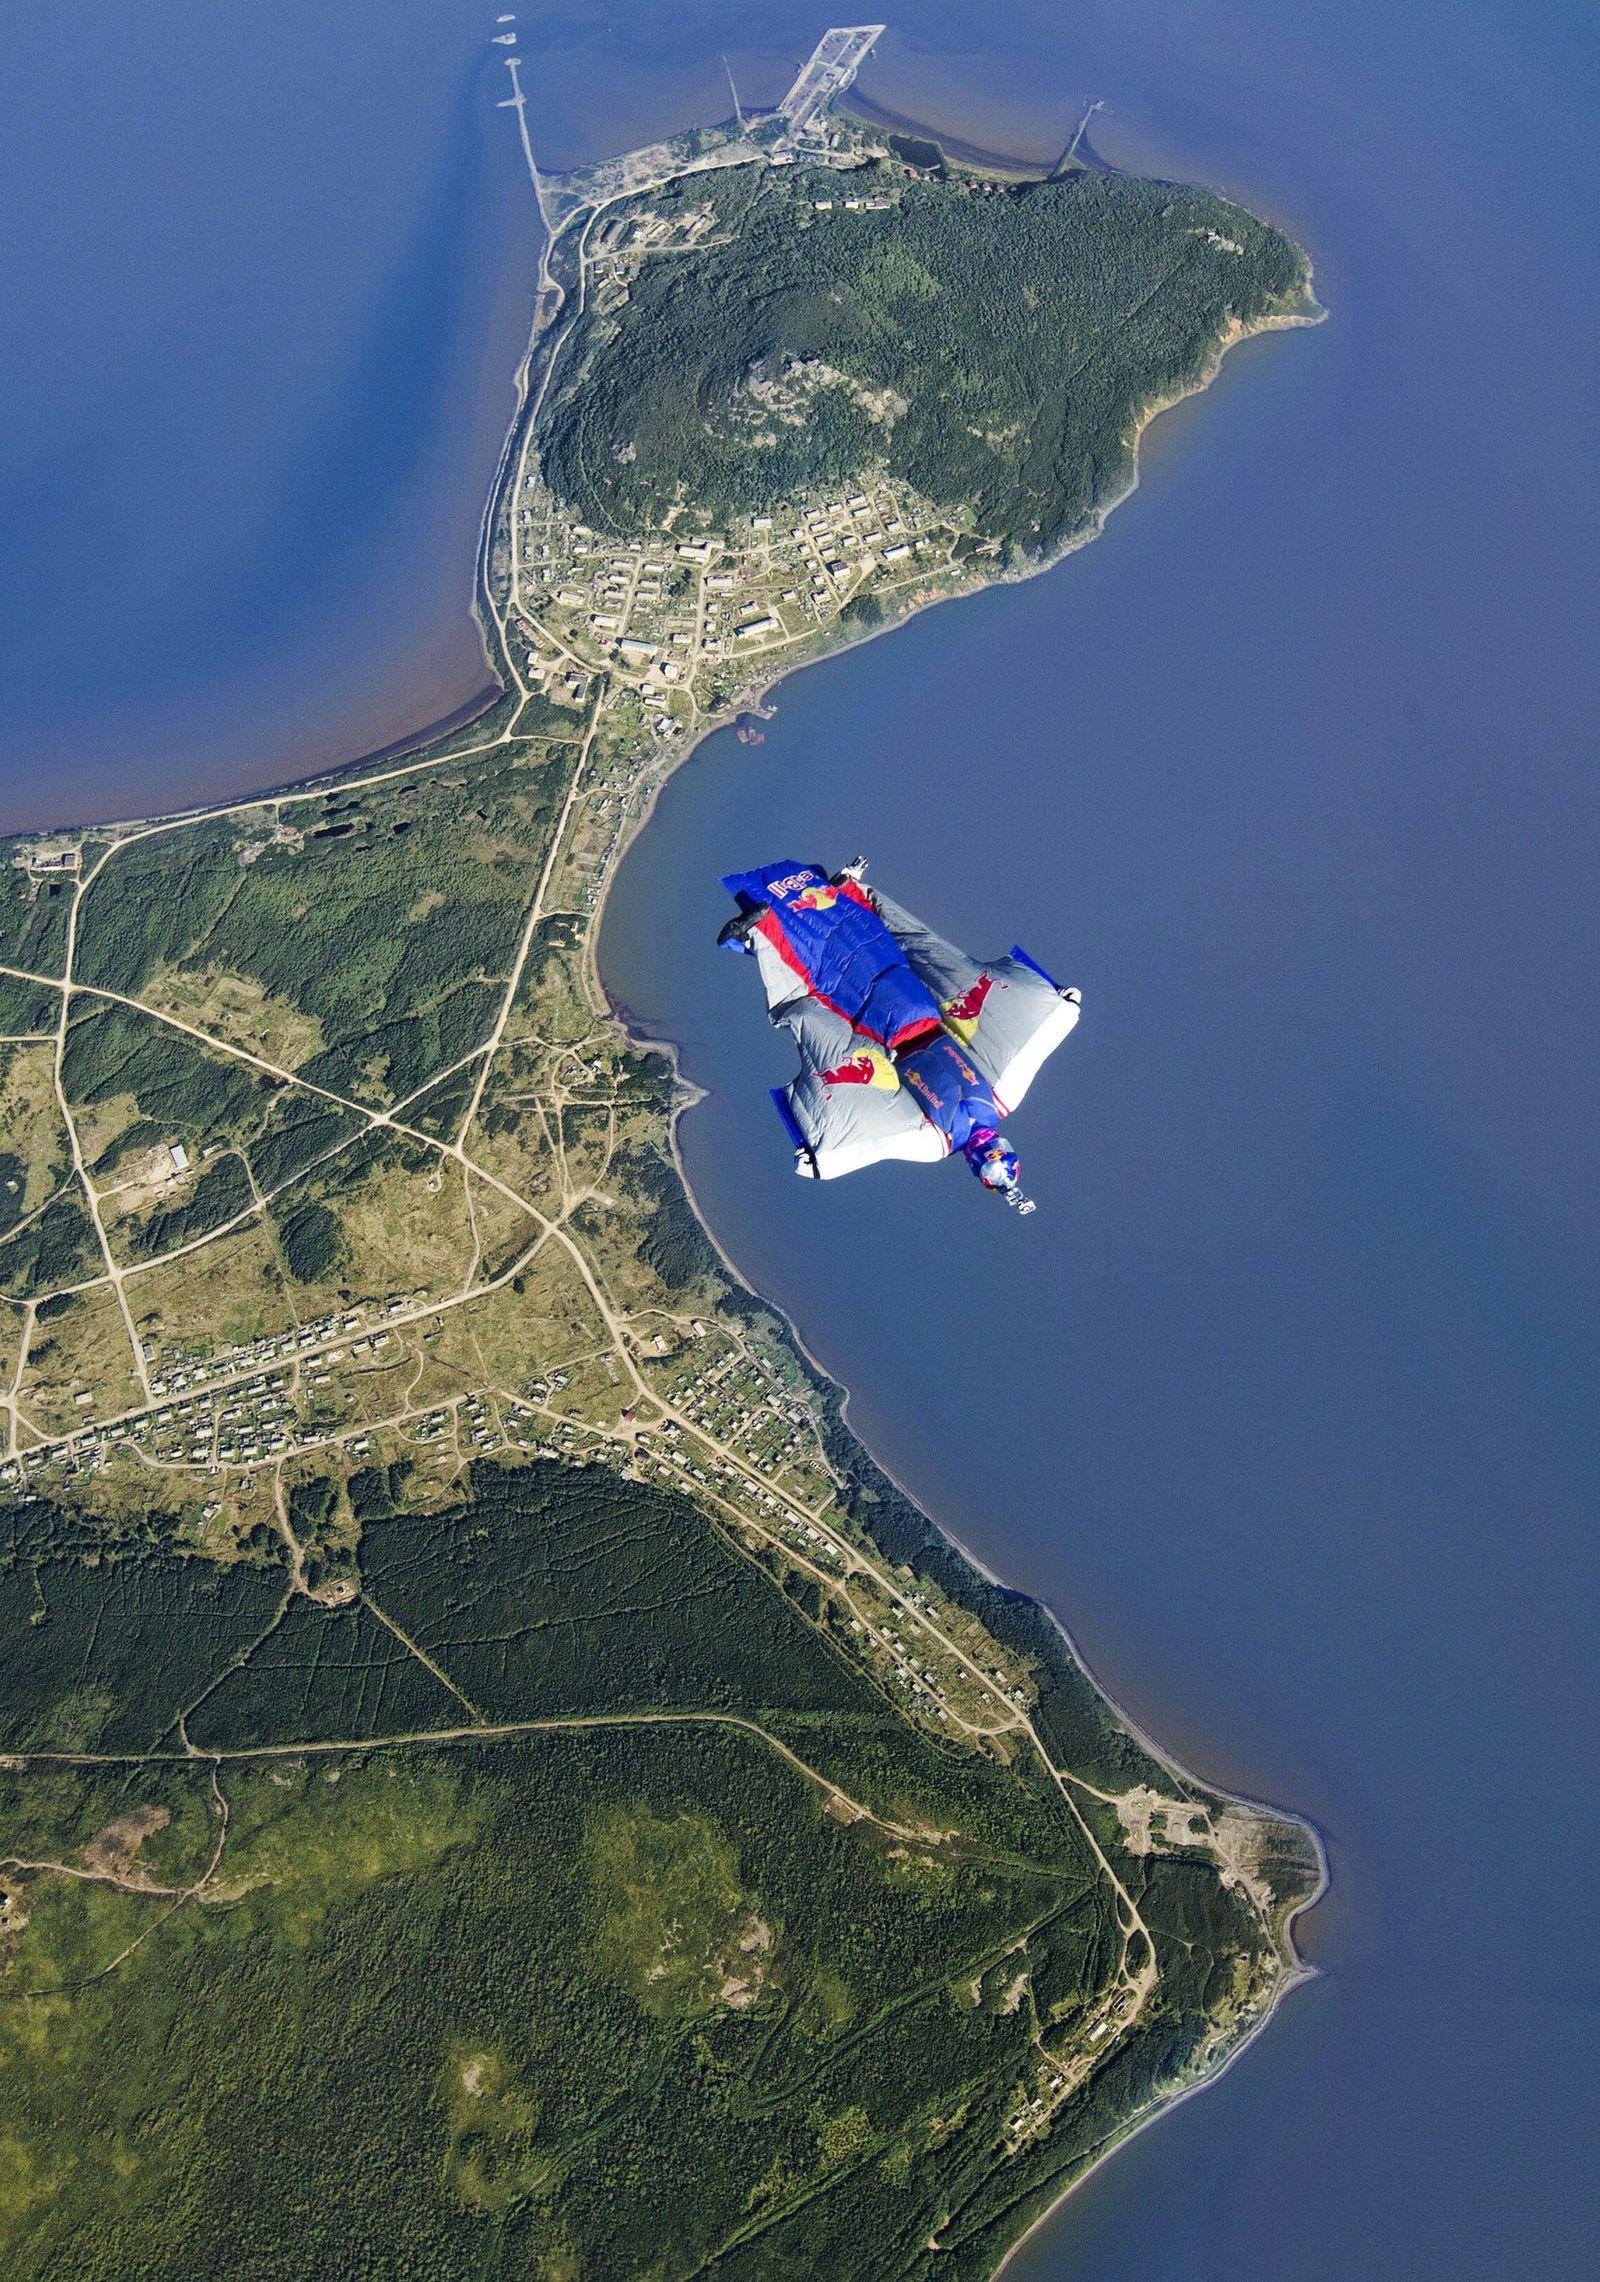 Valery Rozov base jump